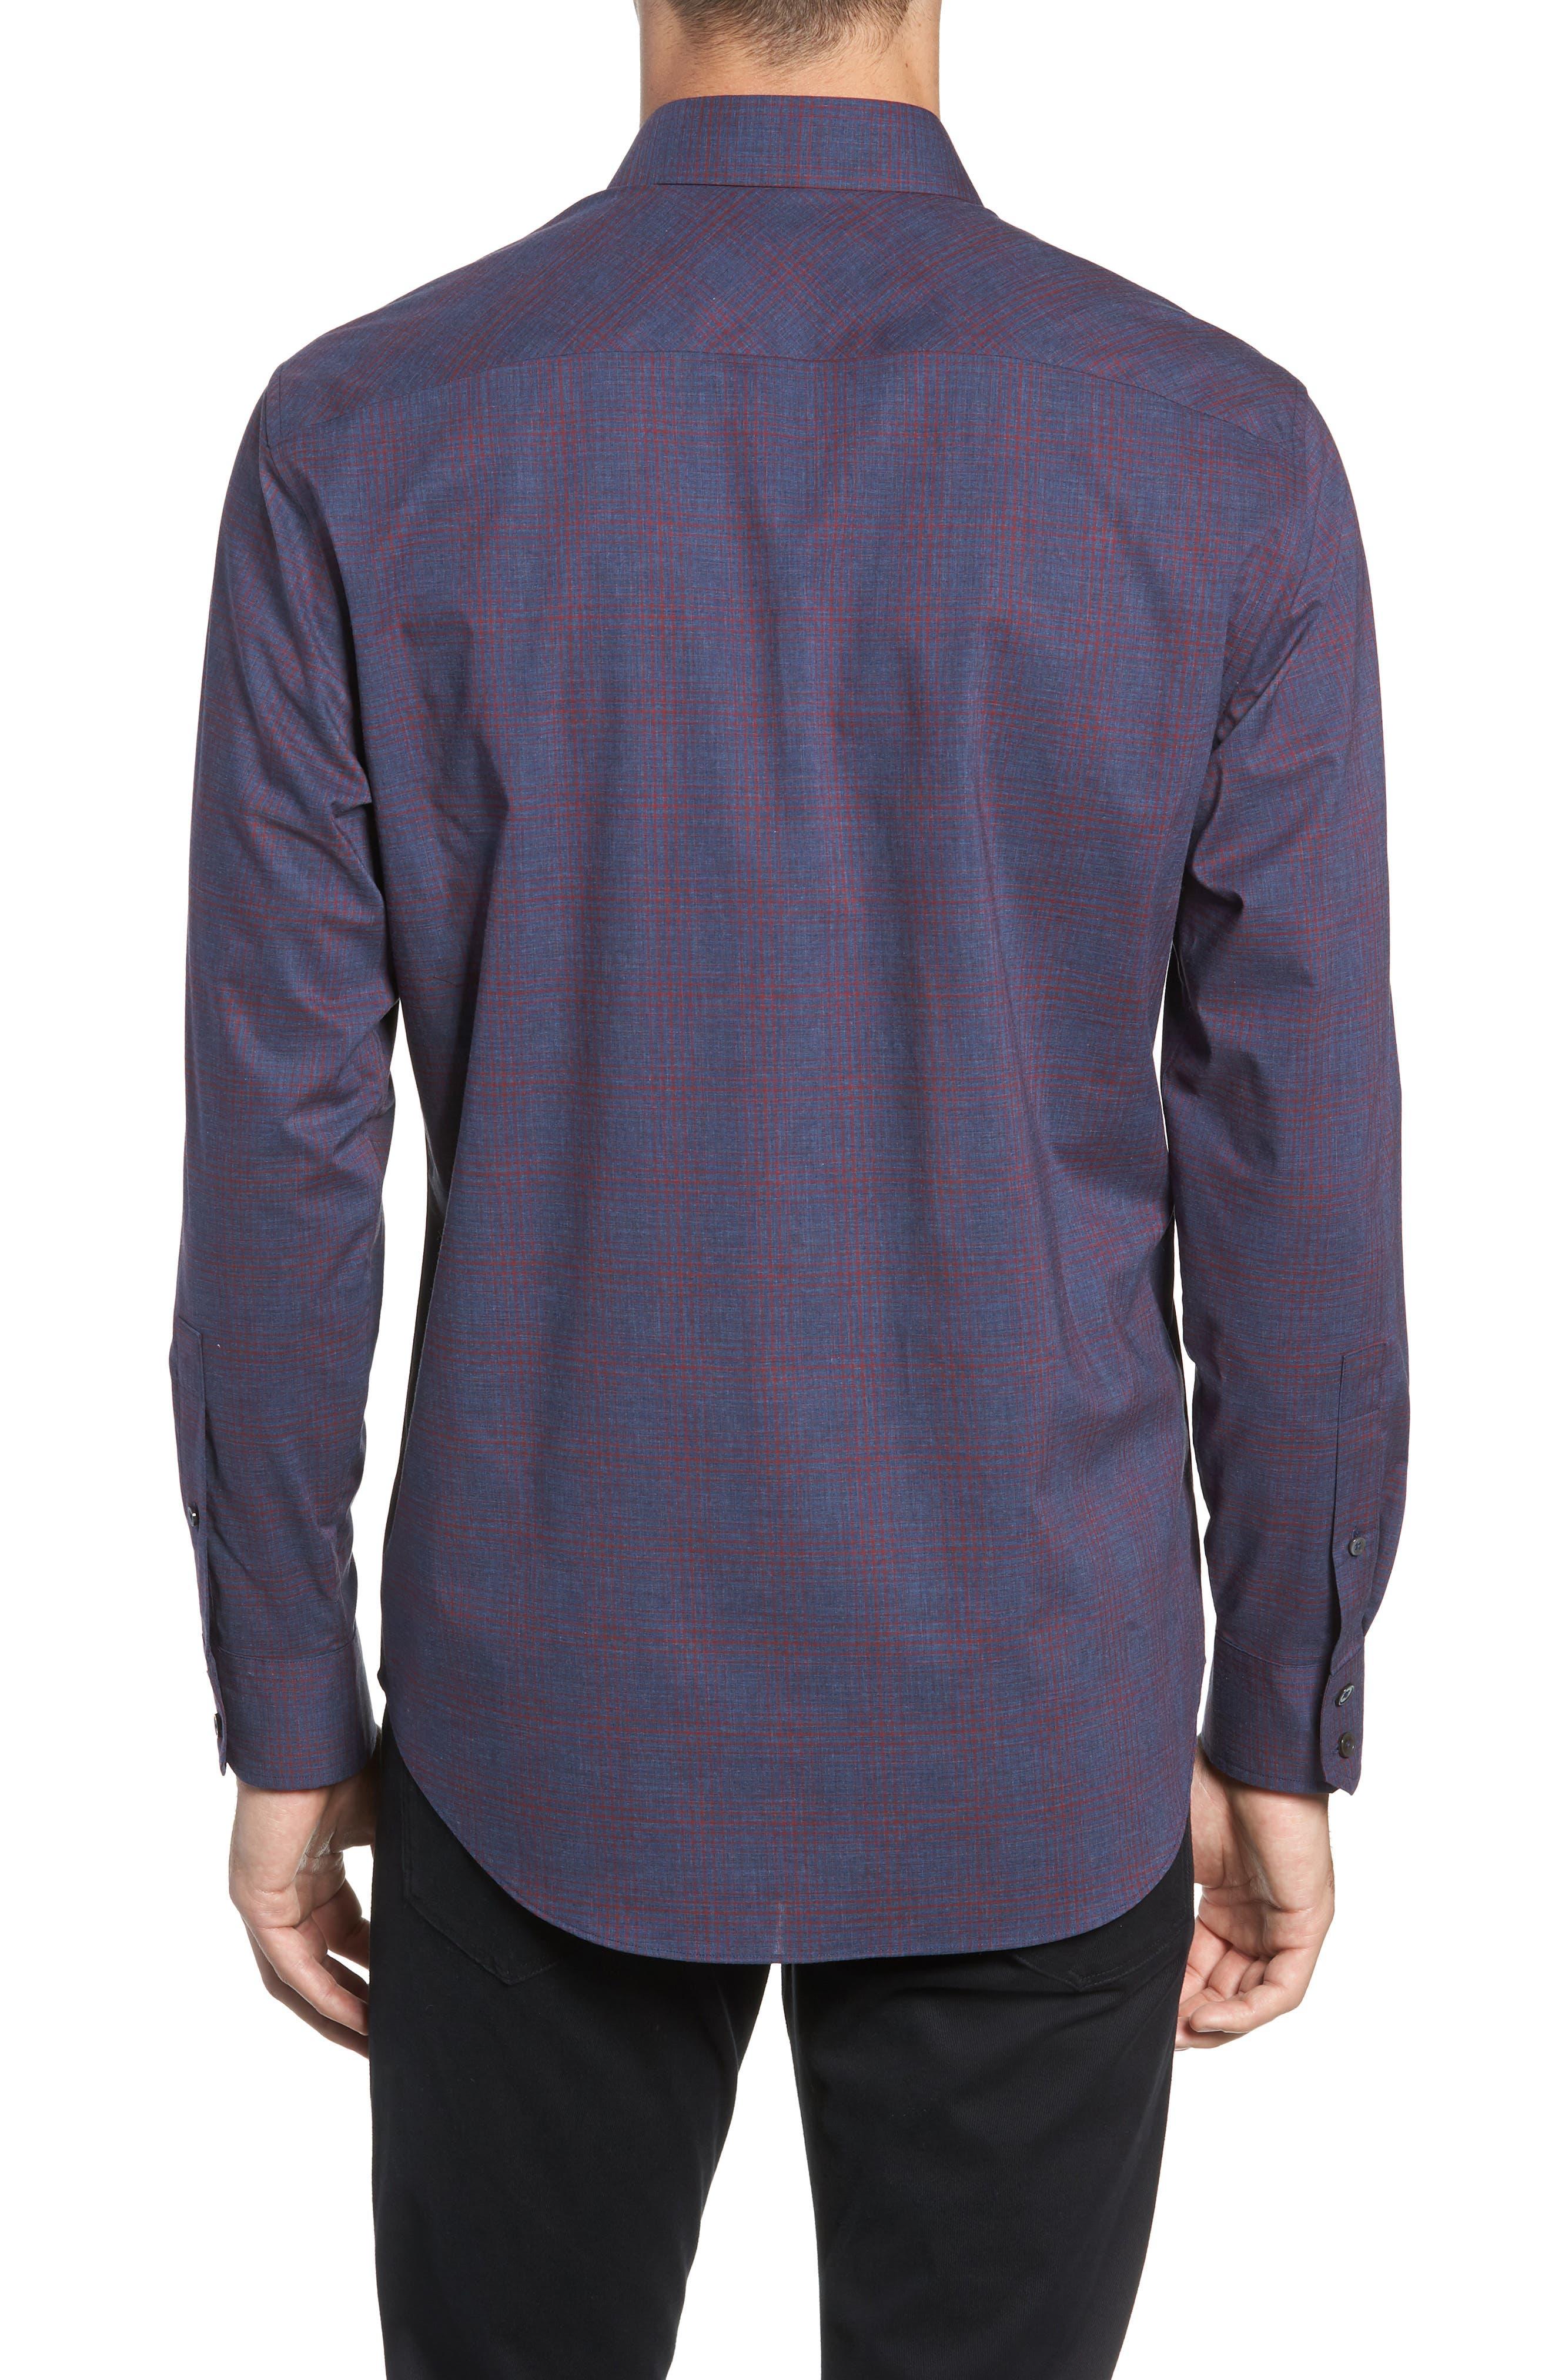 ZACHARY PRELL,                             Maslin Regular Fit Sport Shirt,                             Alternate thumbnail 3, color,                             461